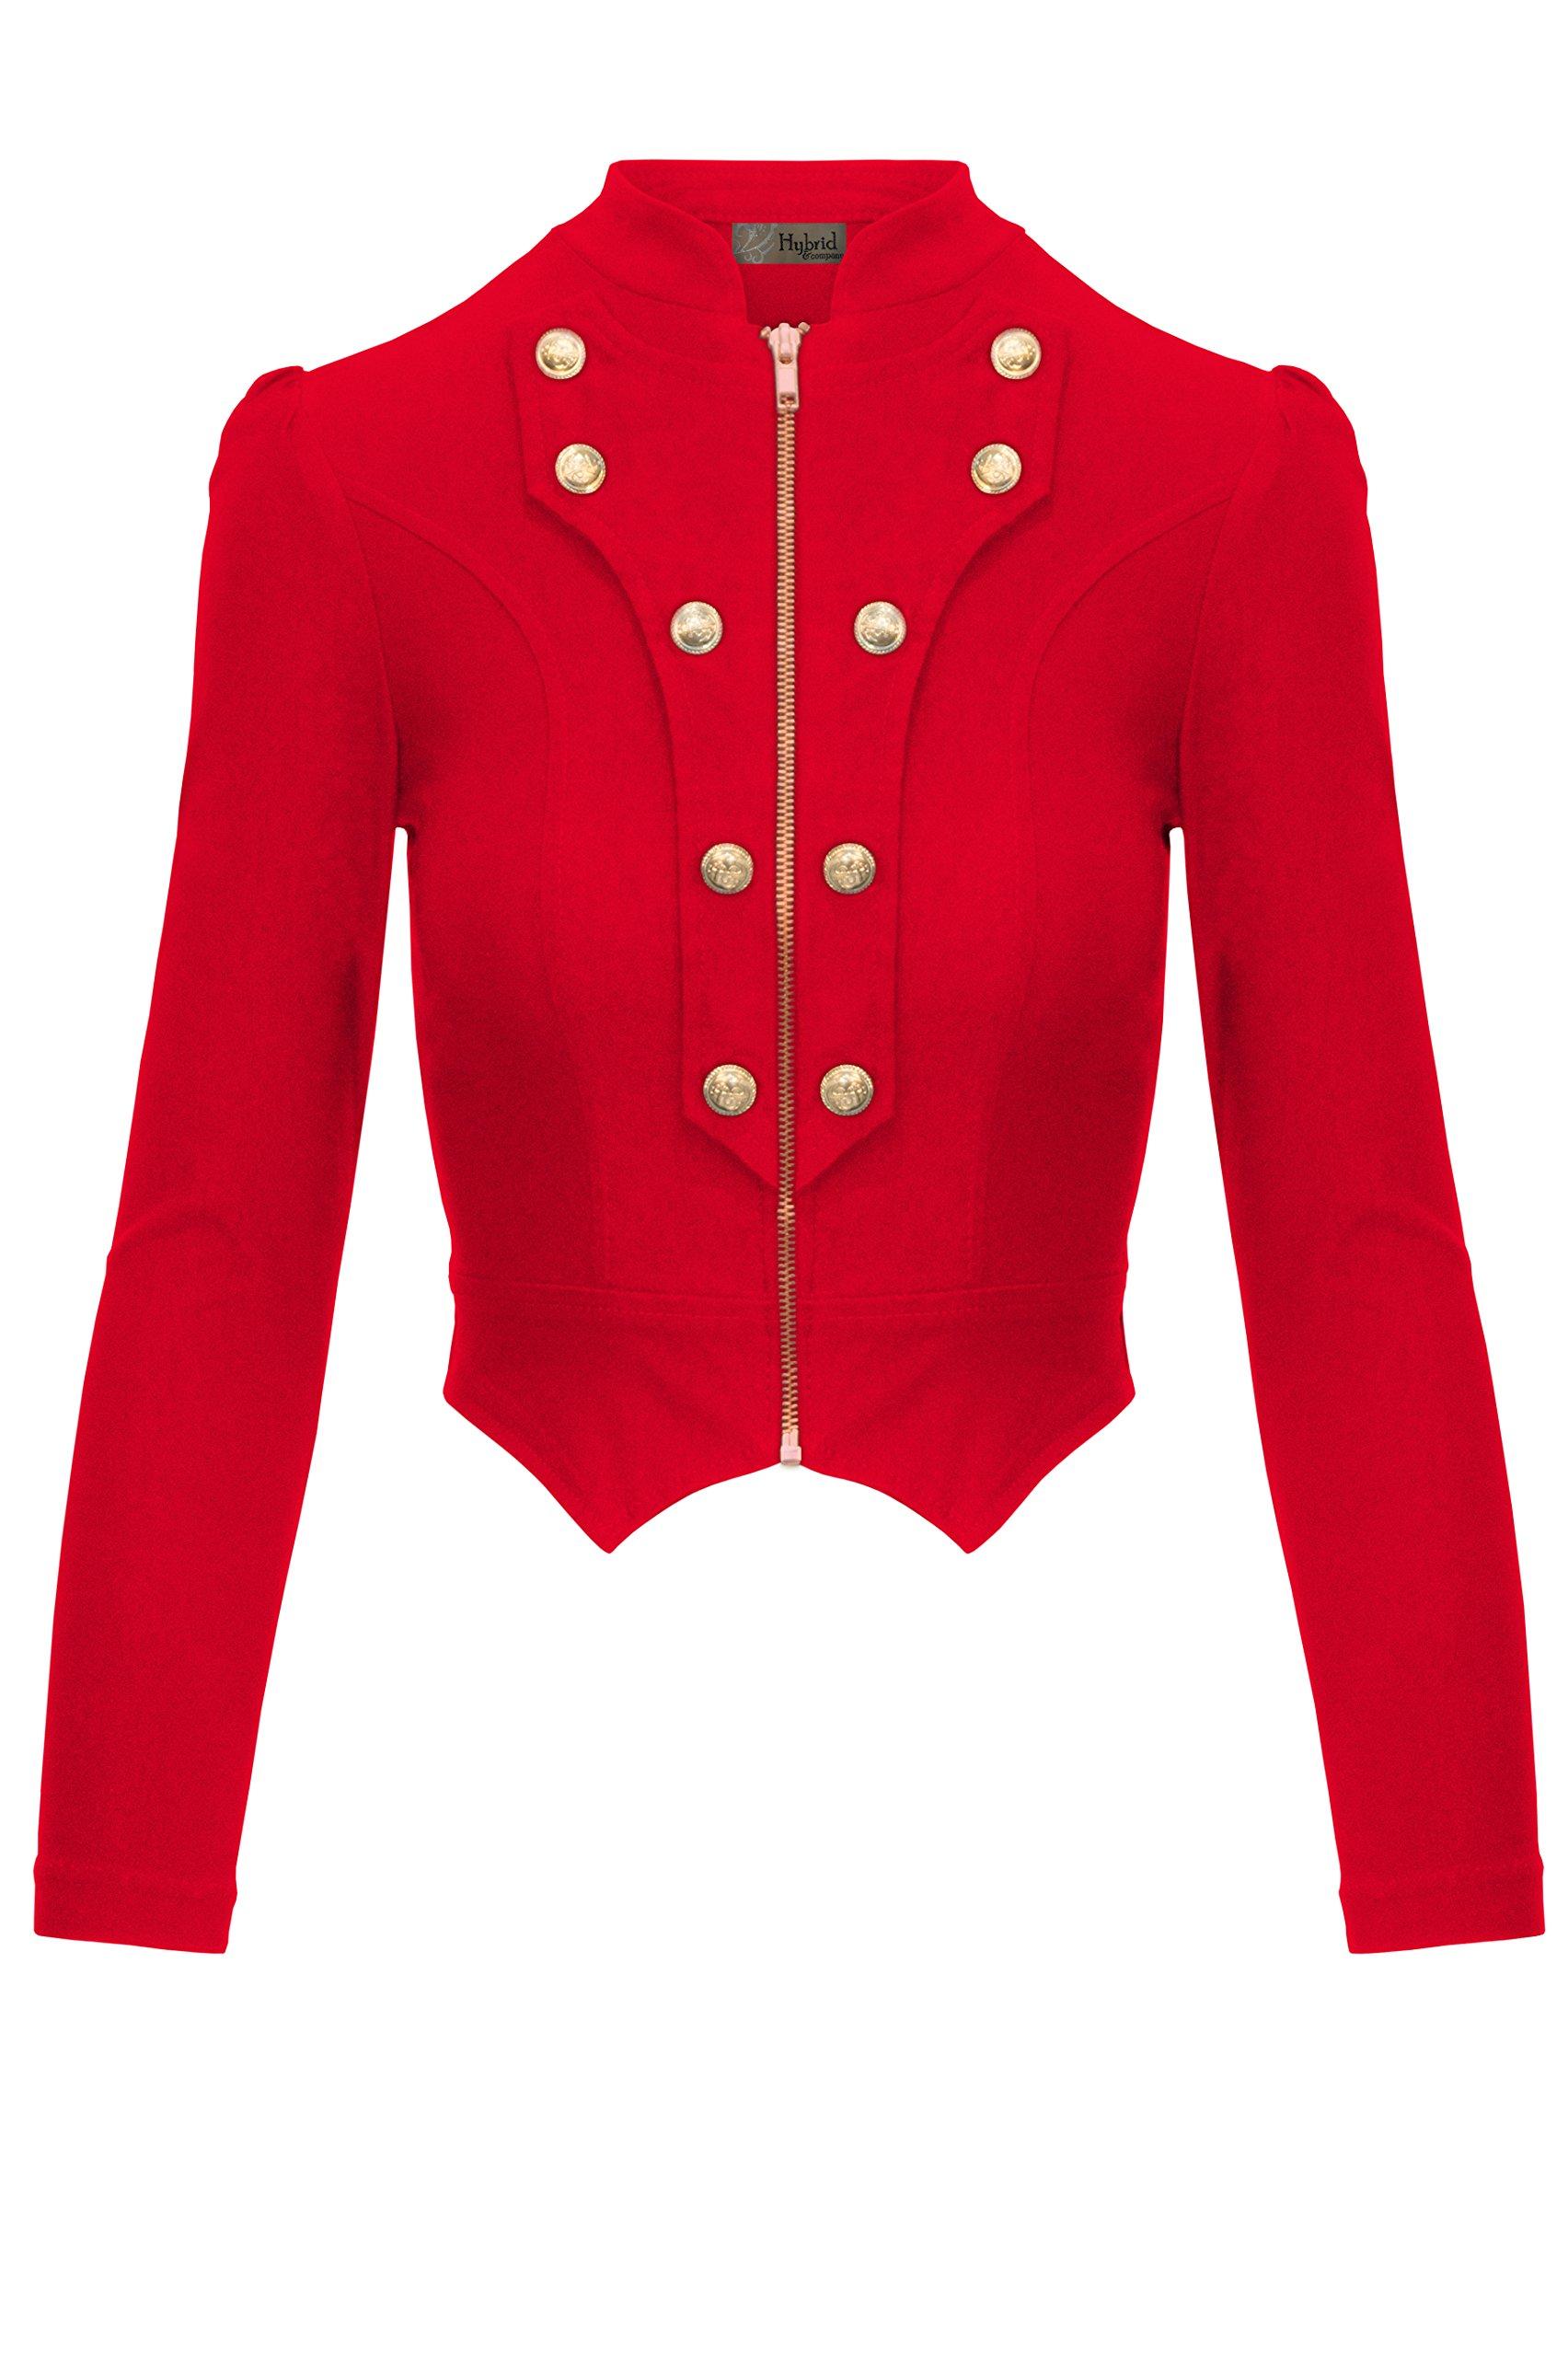 HyBrid & Company Women's Military Crop Stretch Gold Zip up Blazer Jacket KJK1125 Red Small